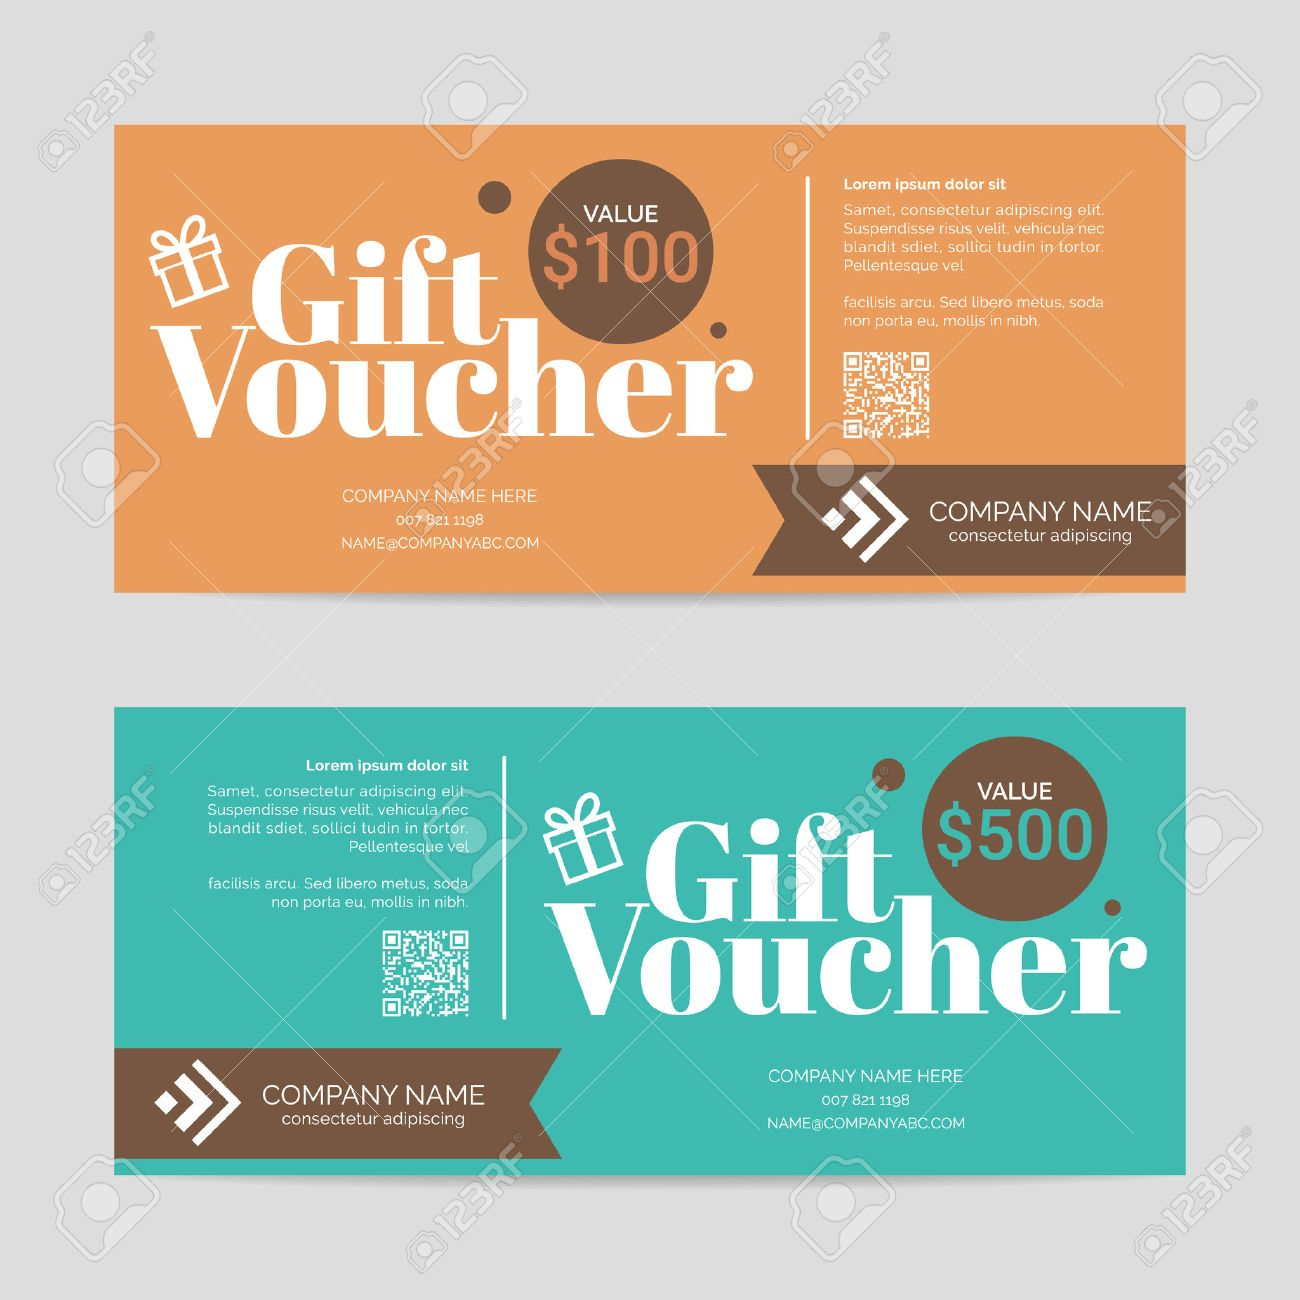 business voucher template – Business Voucher Template